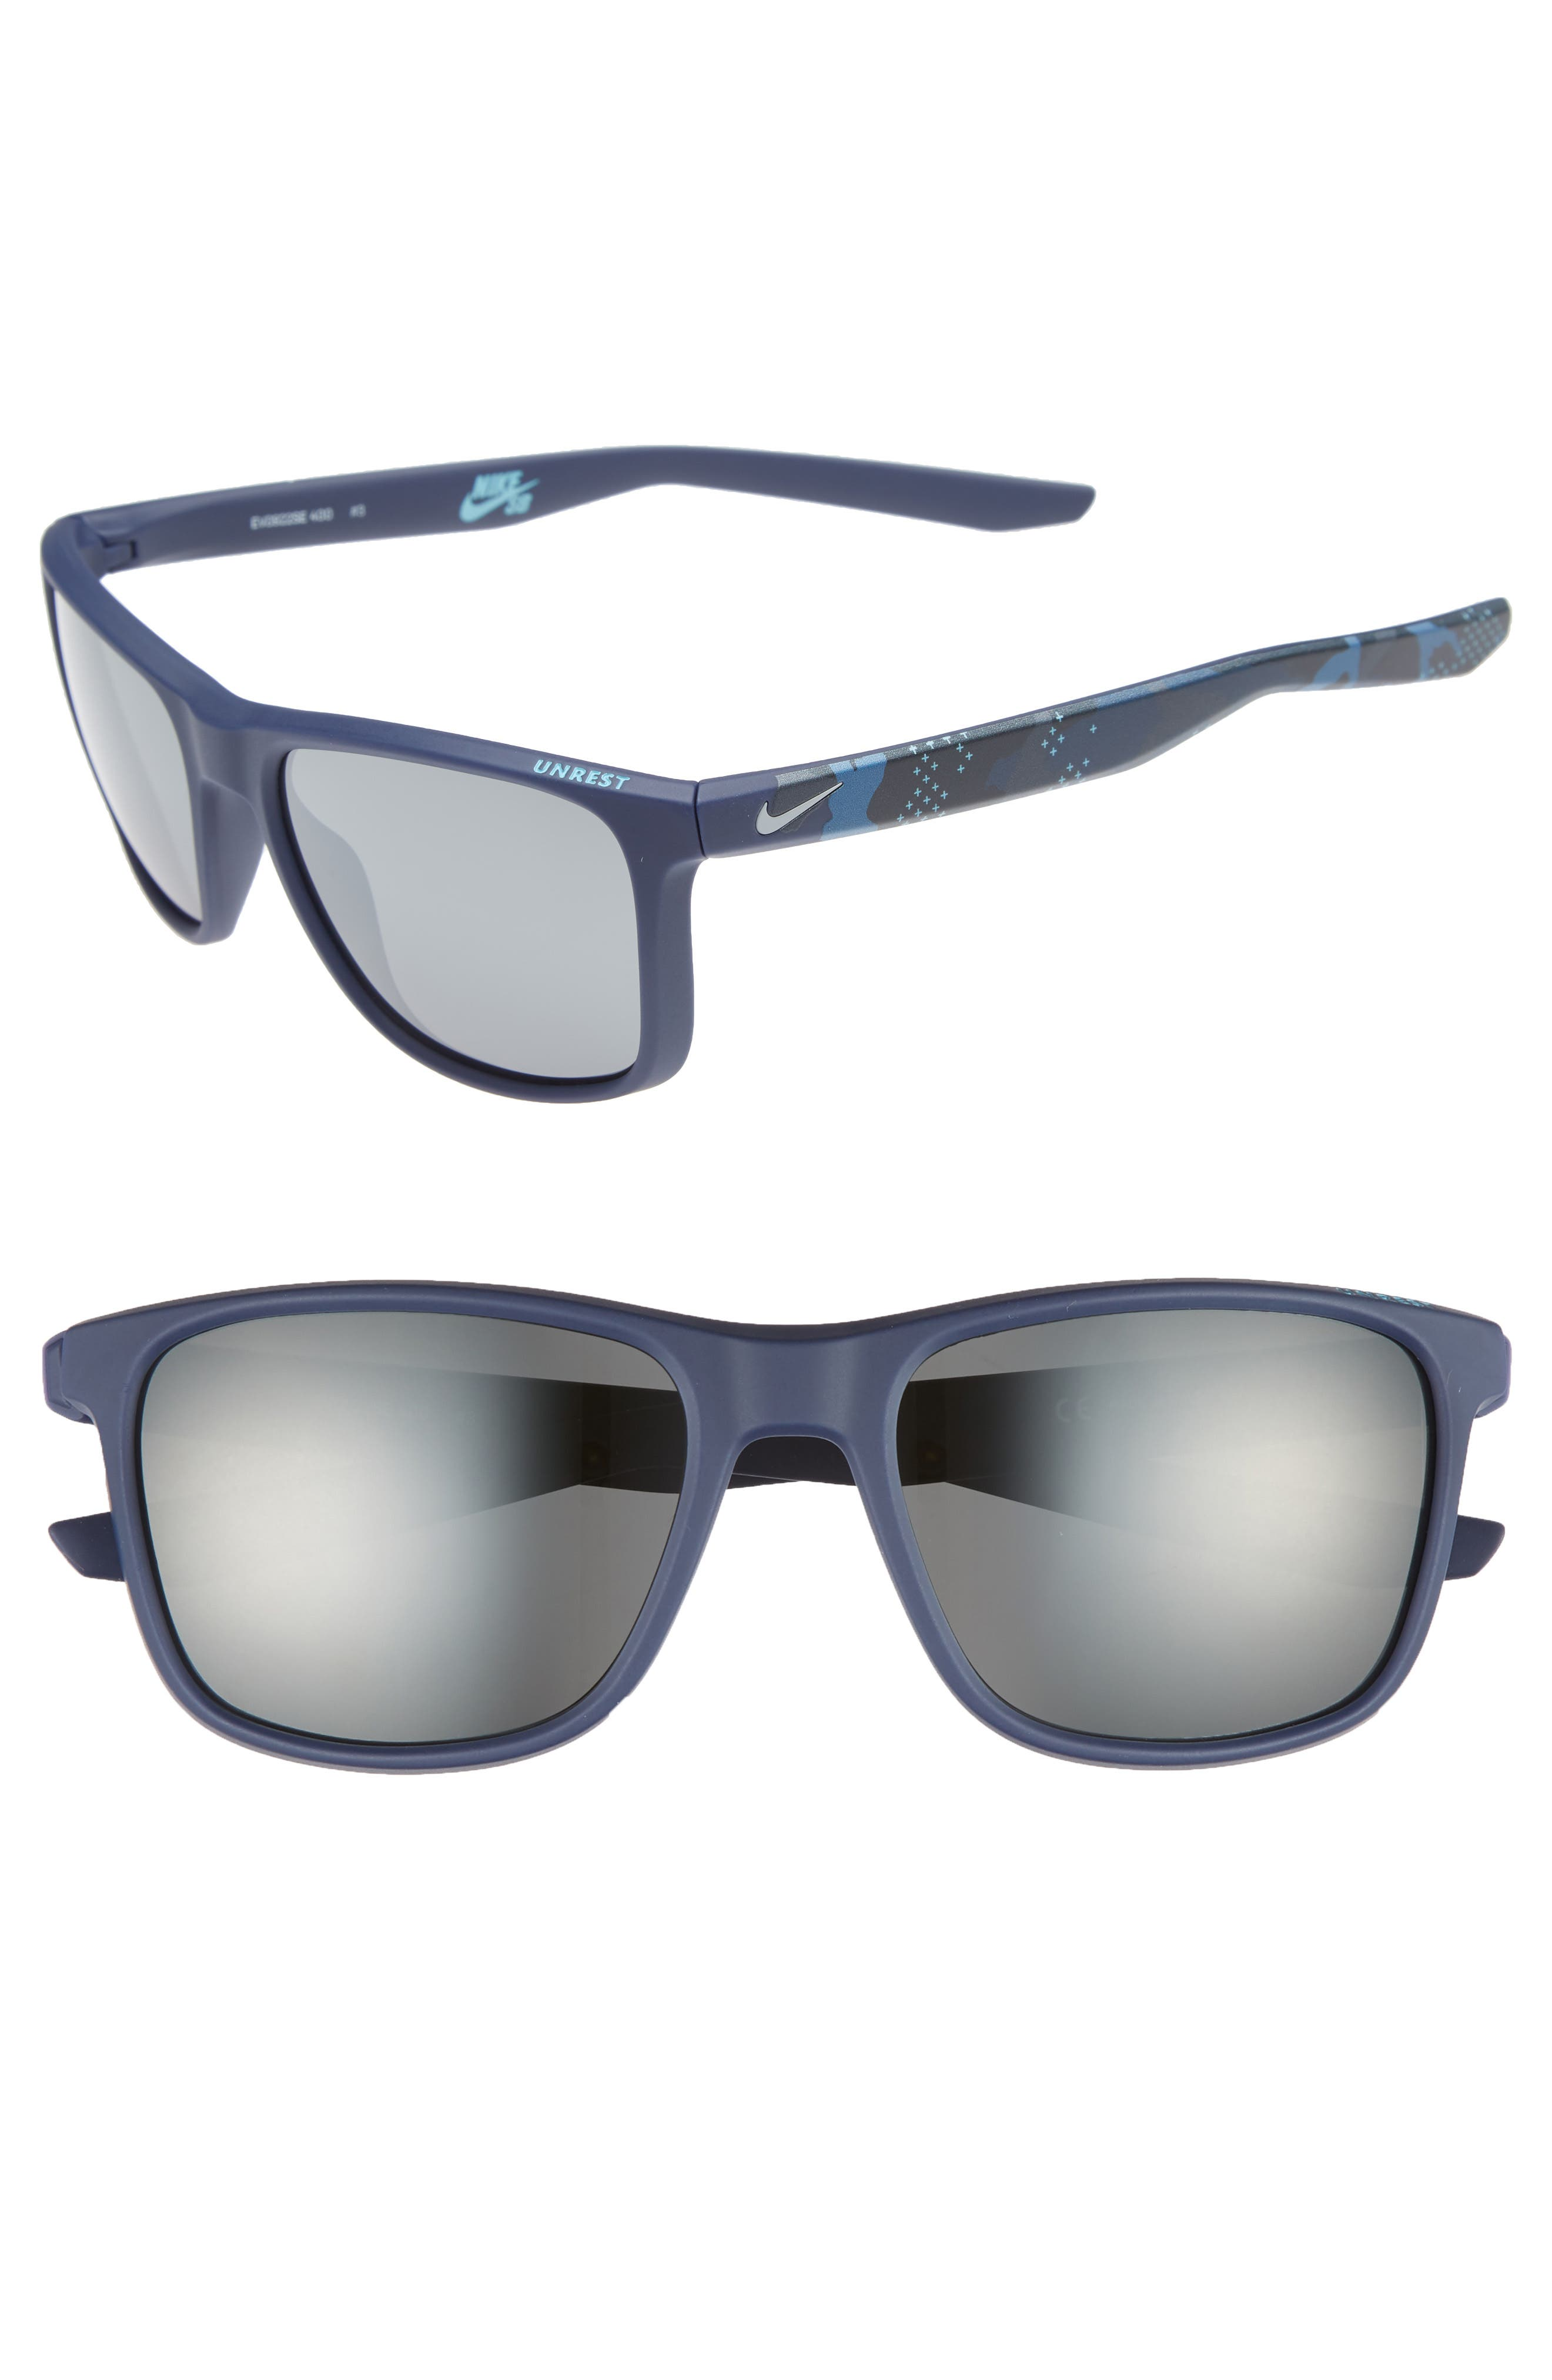 Unrest SE 57mm Sunglasses,                         Main,                         color, Midnight Teal/ Dark Grey